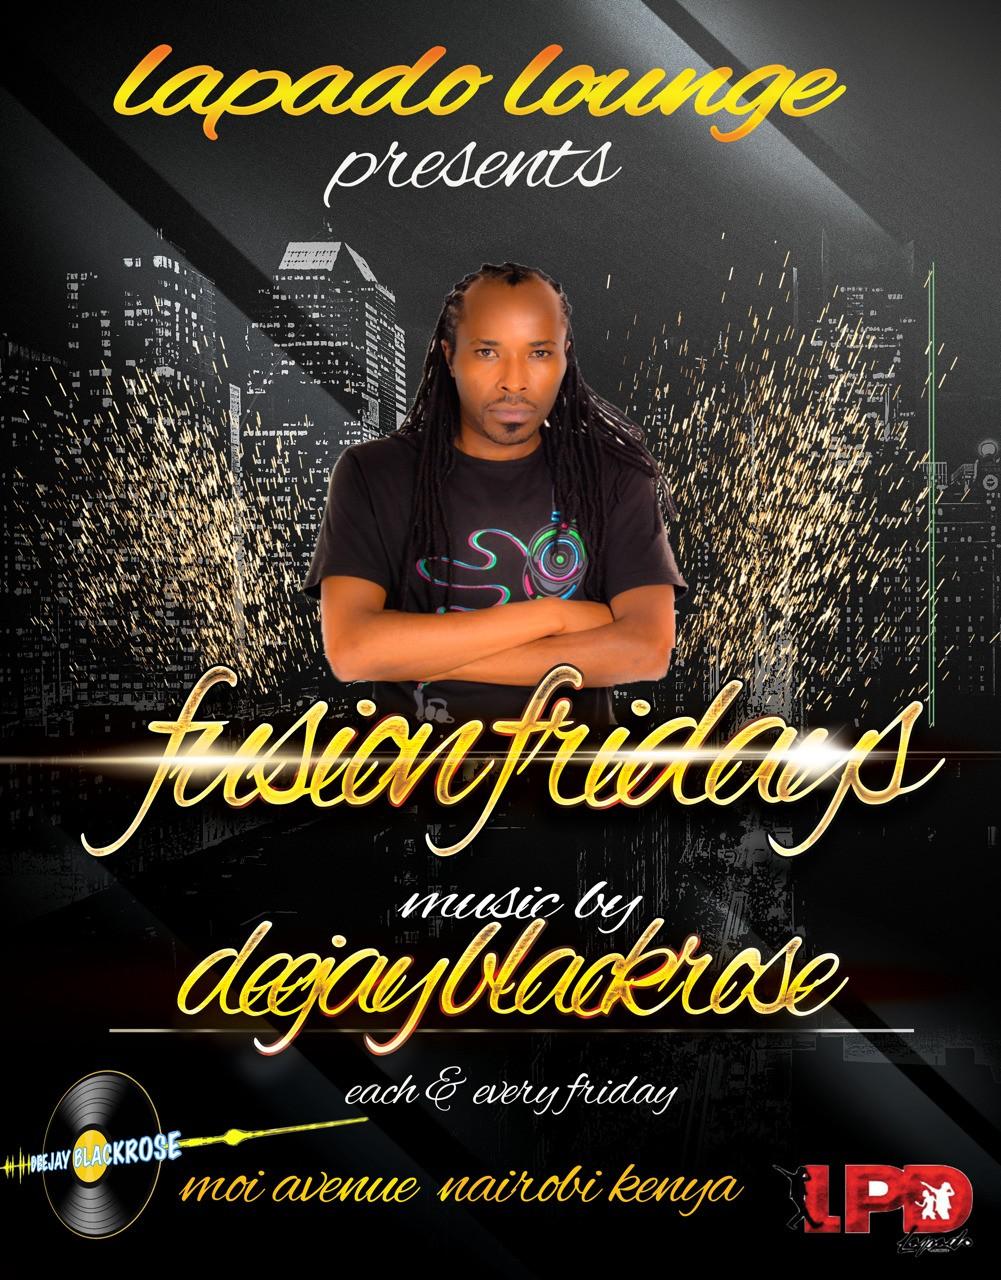 Blackrose Entertainment , welcomes you to our fusion fridays at lapado lounge on moi avenue in Nairobi Kenya .